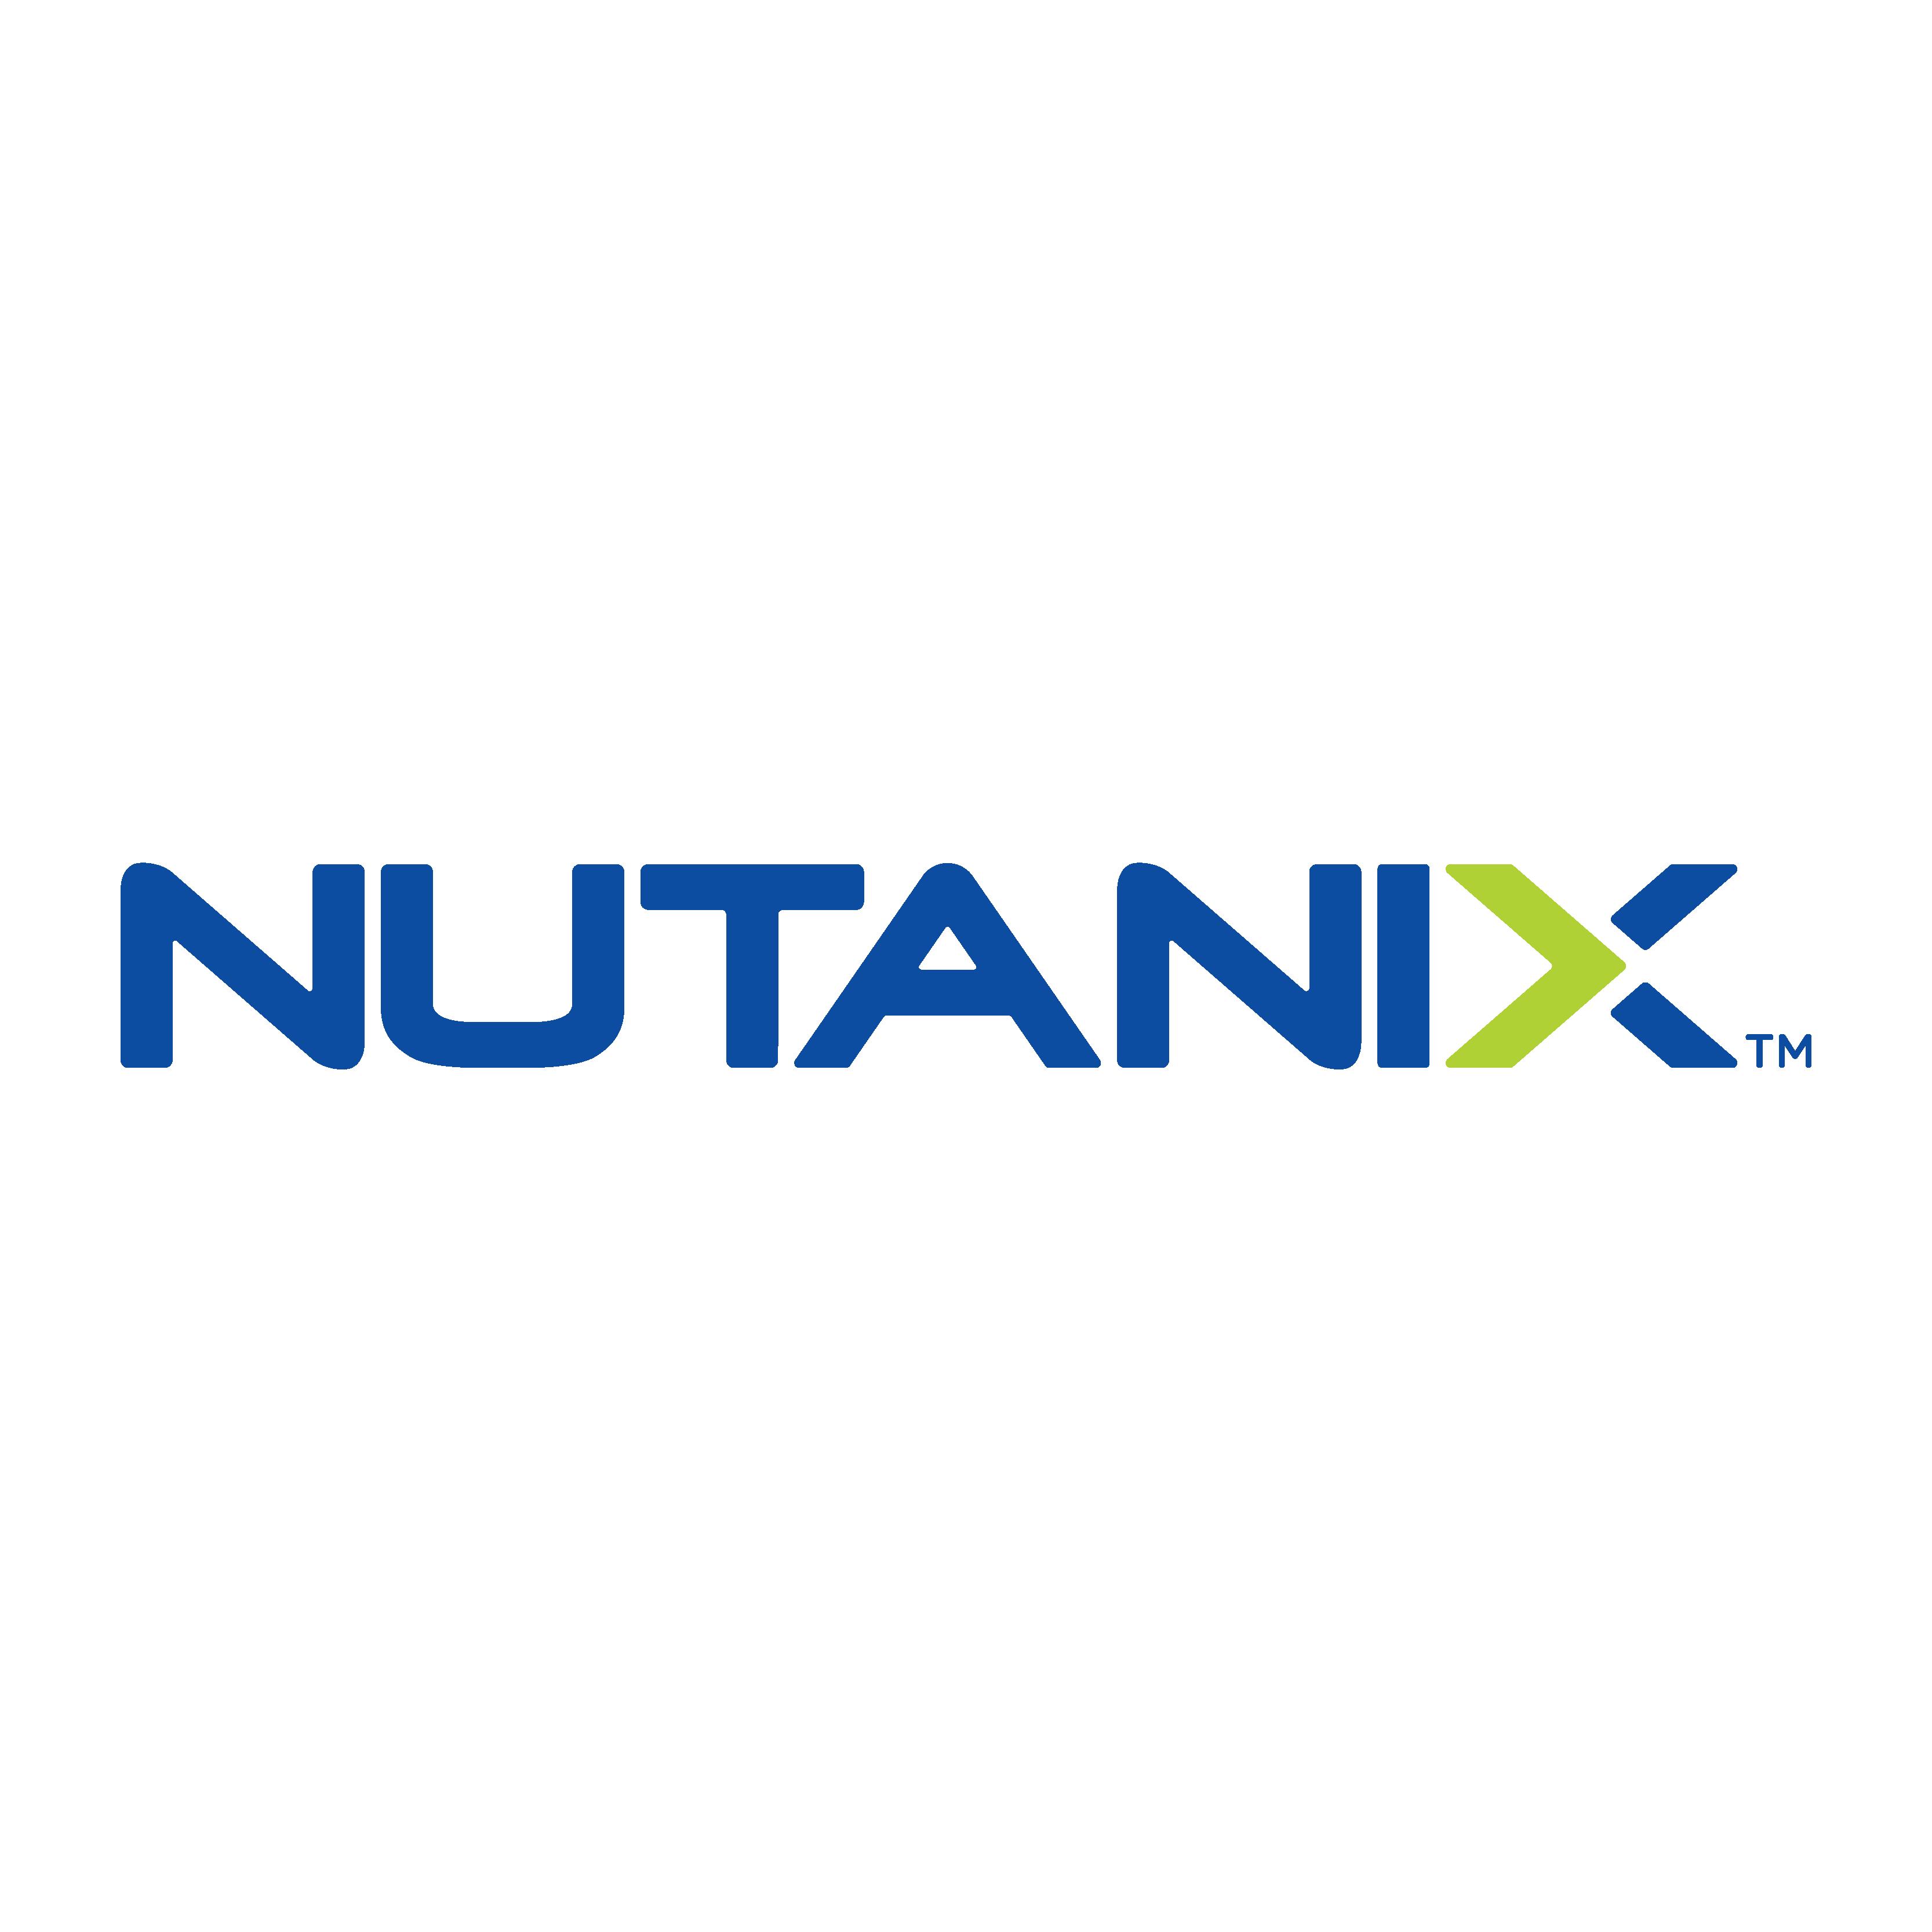 Nutanix Tectrade